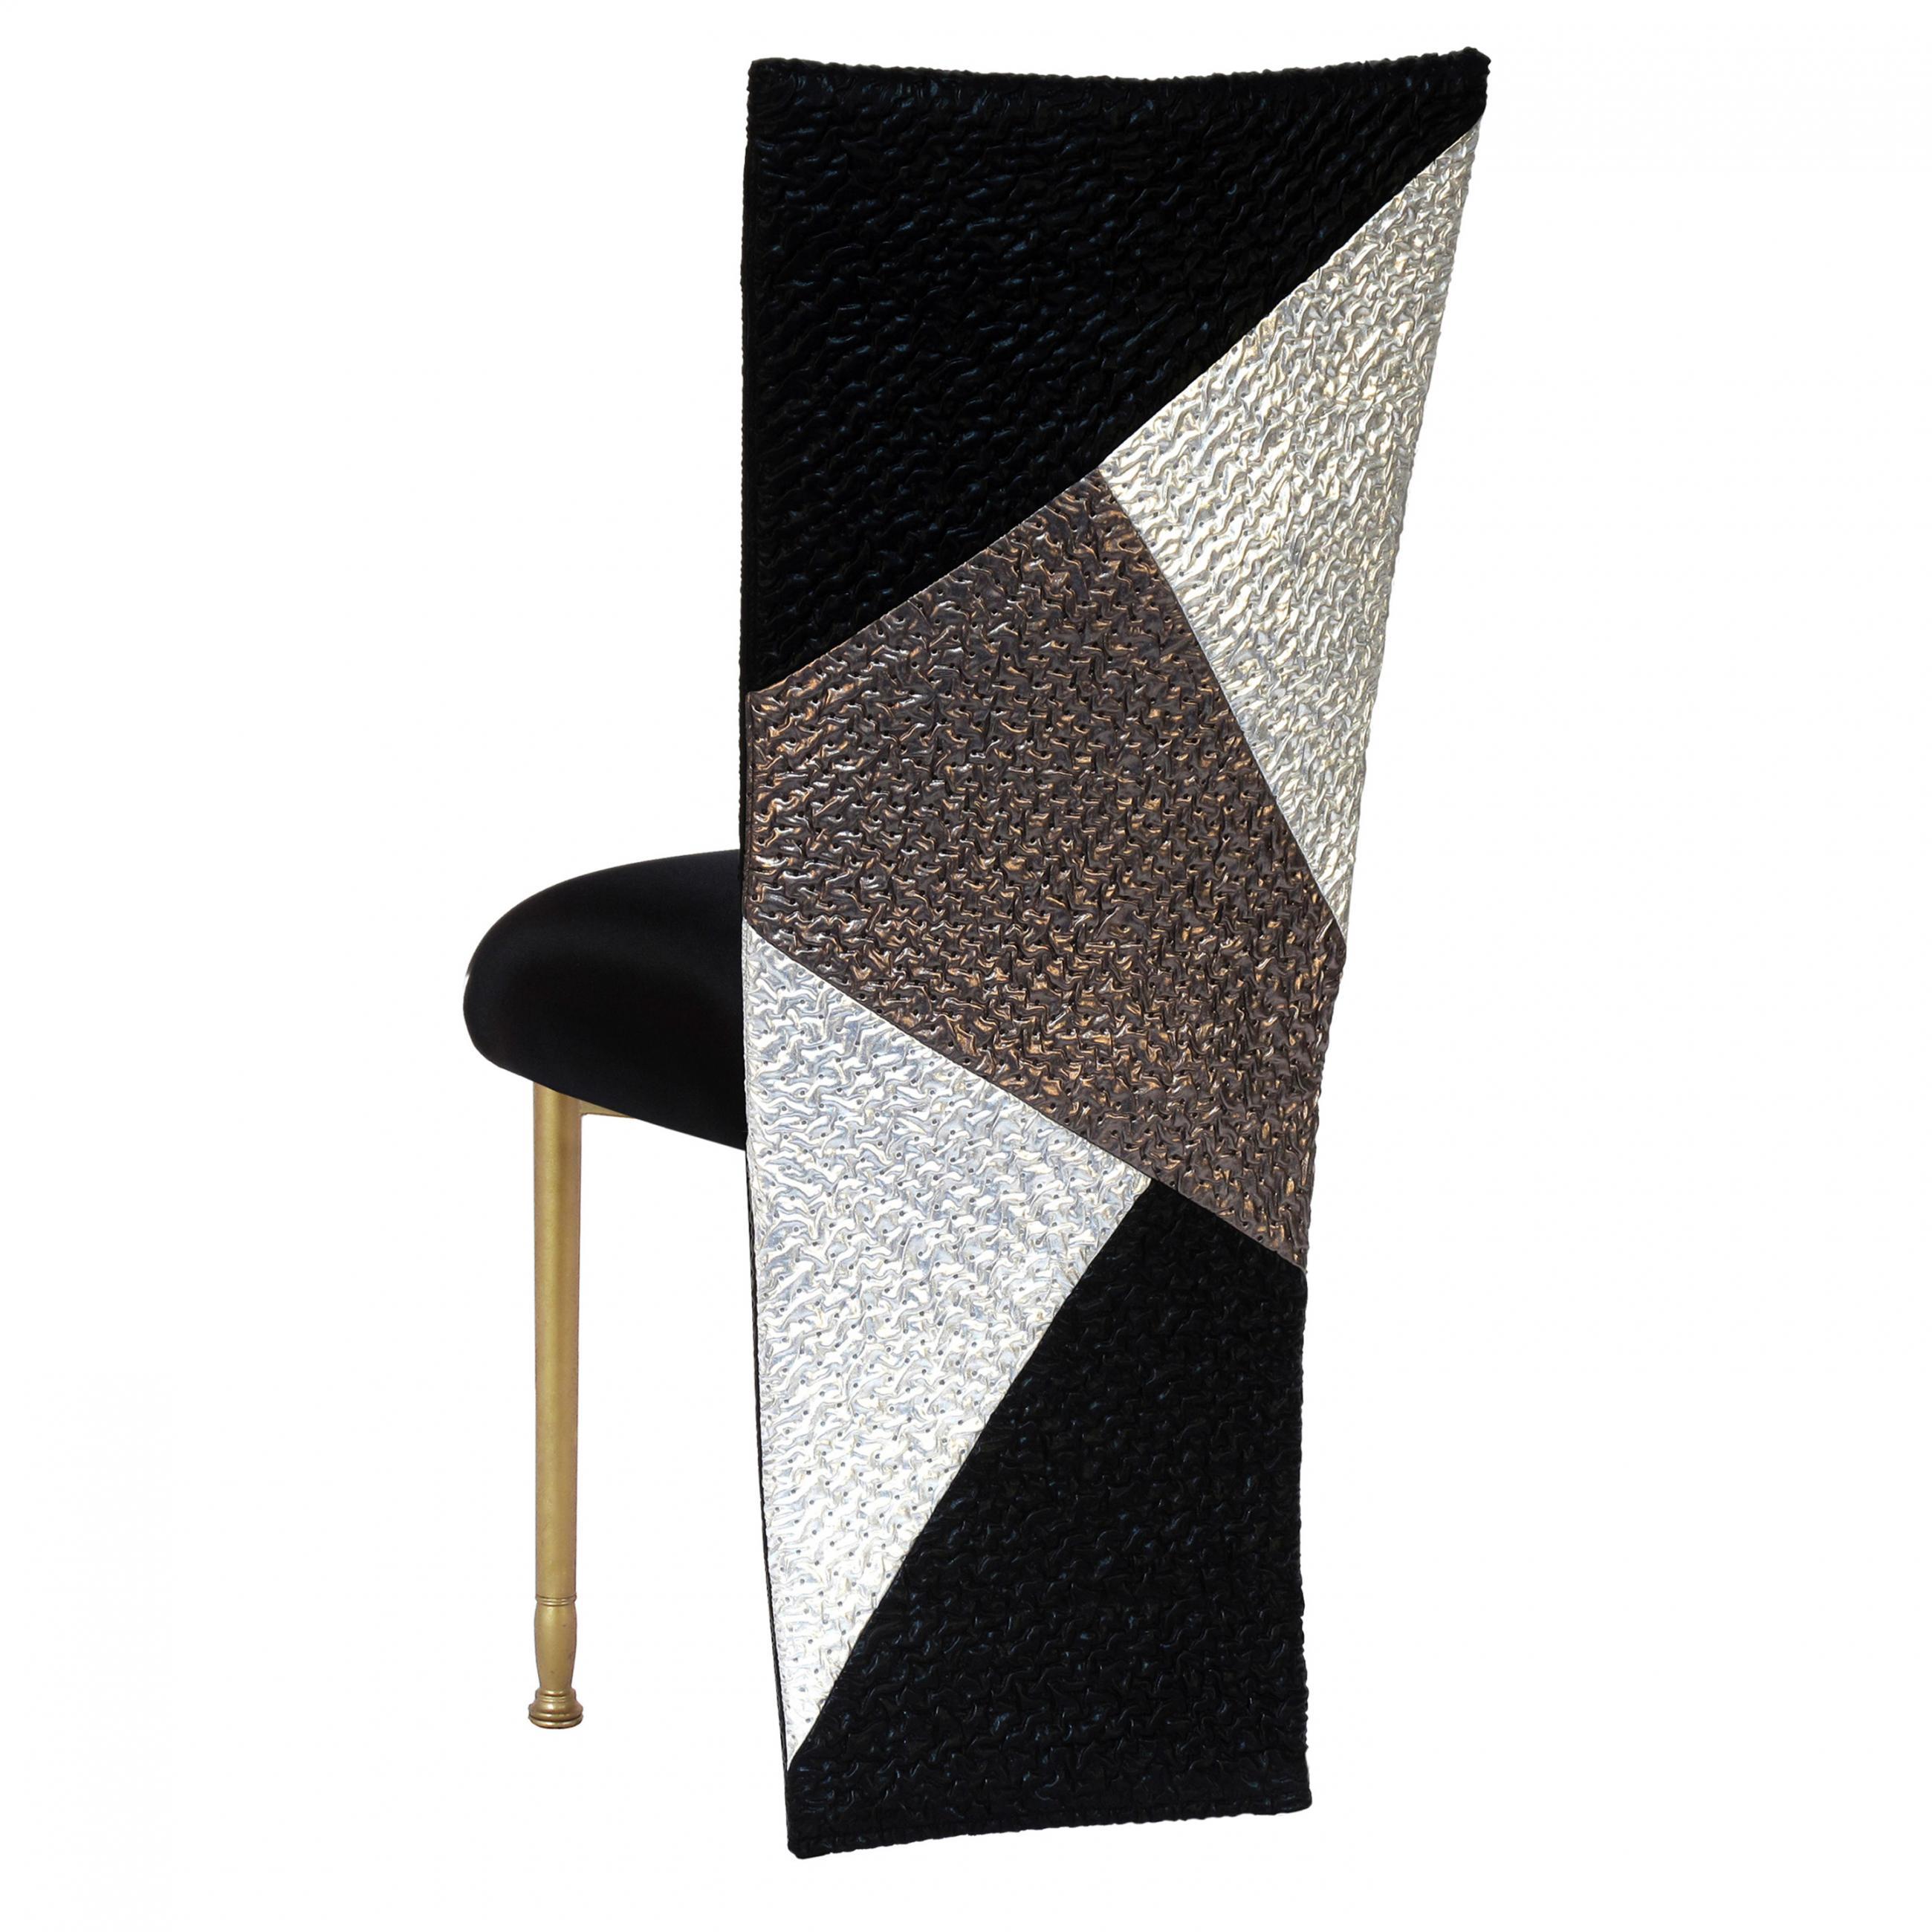 Astonishing Stretch Knit Metropolis Fanfare Chameleon Chair Jacket Machost Co Dining Chair Design Ideas Machostcouk